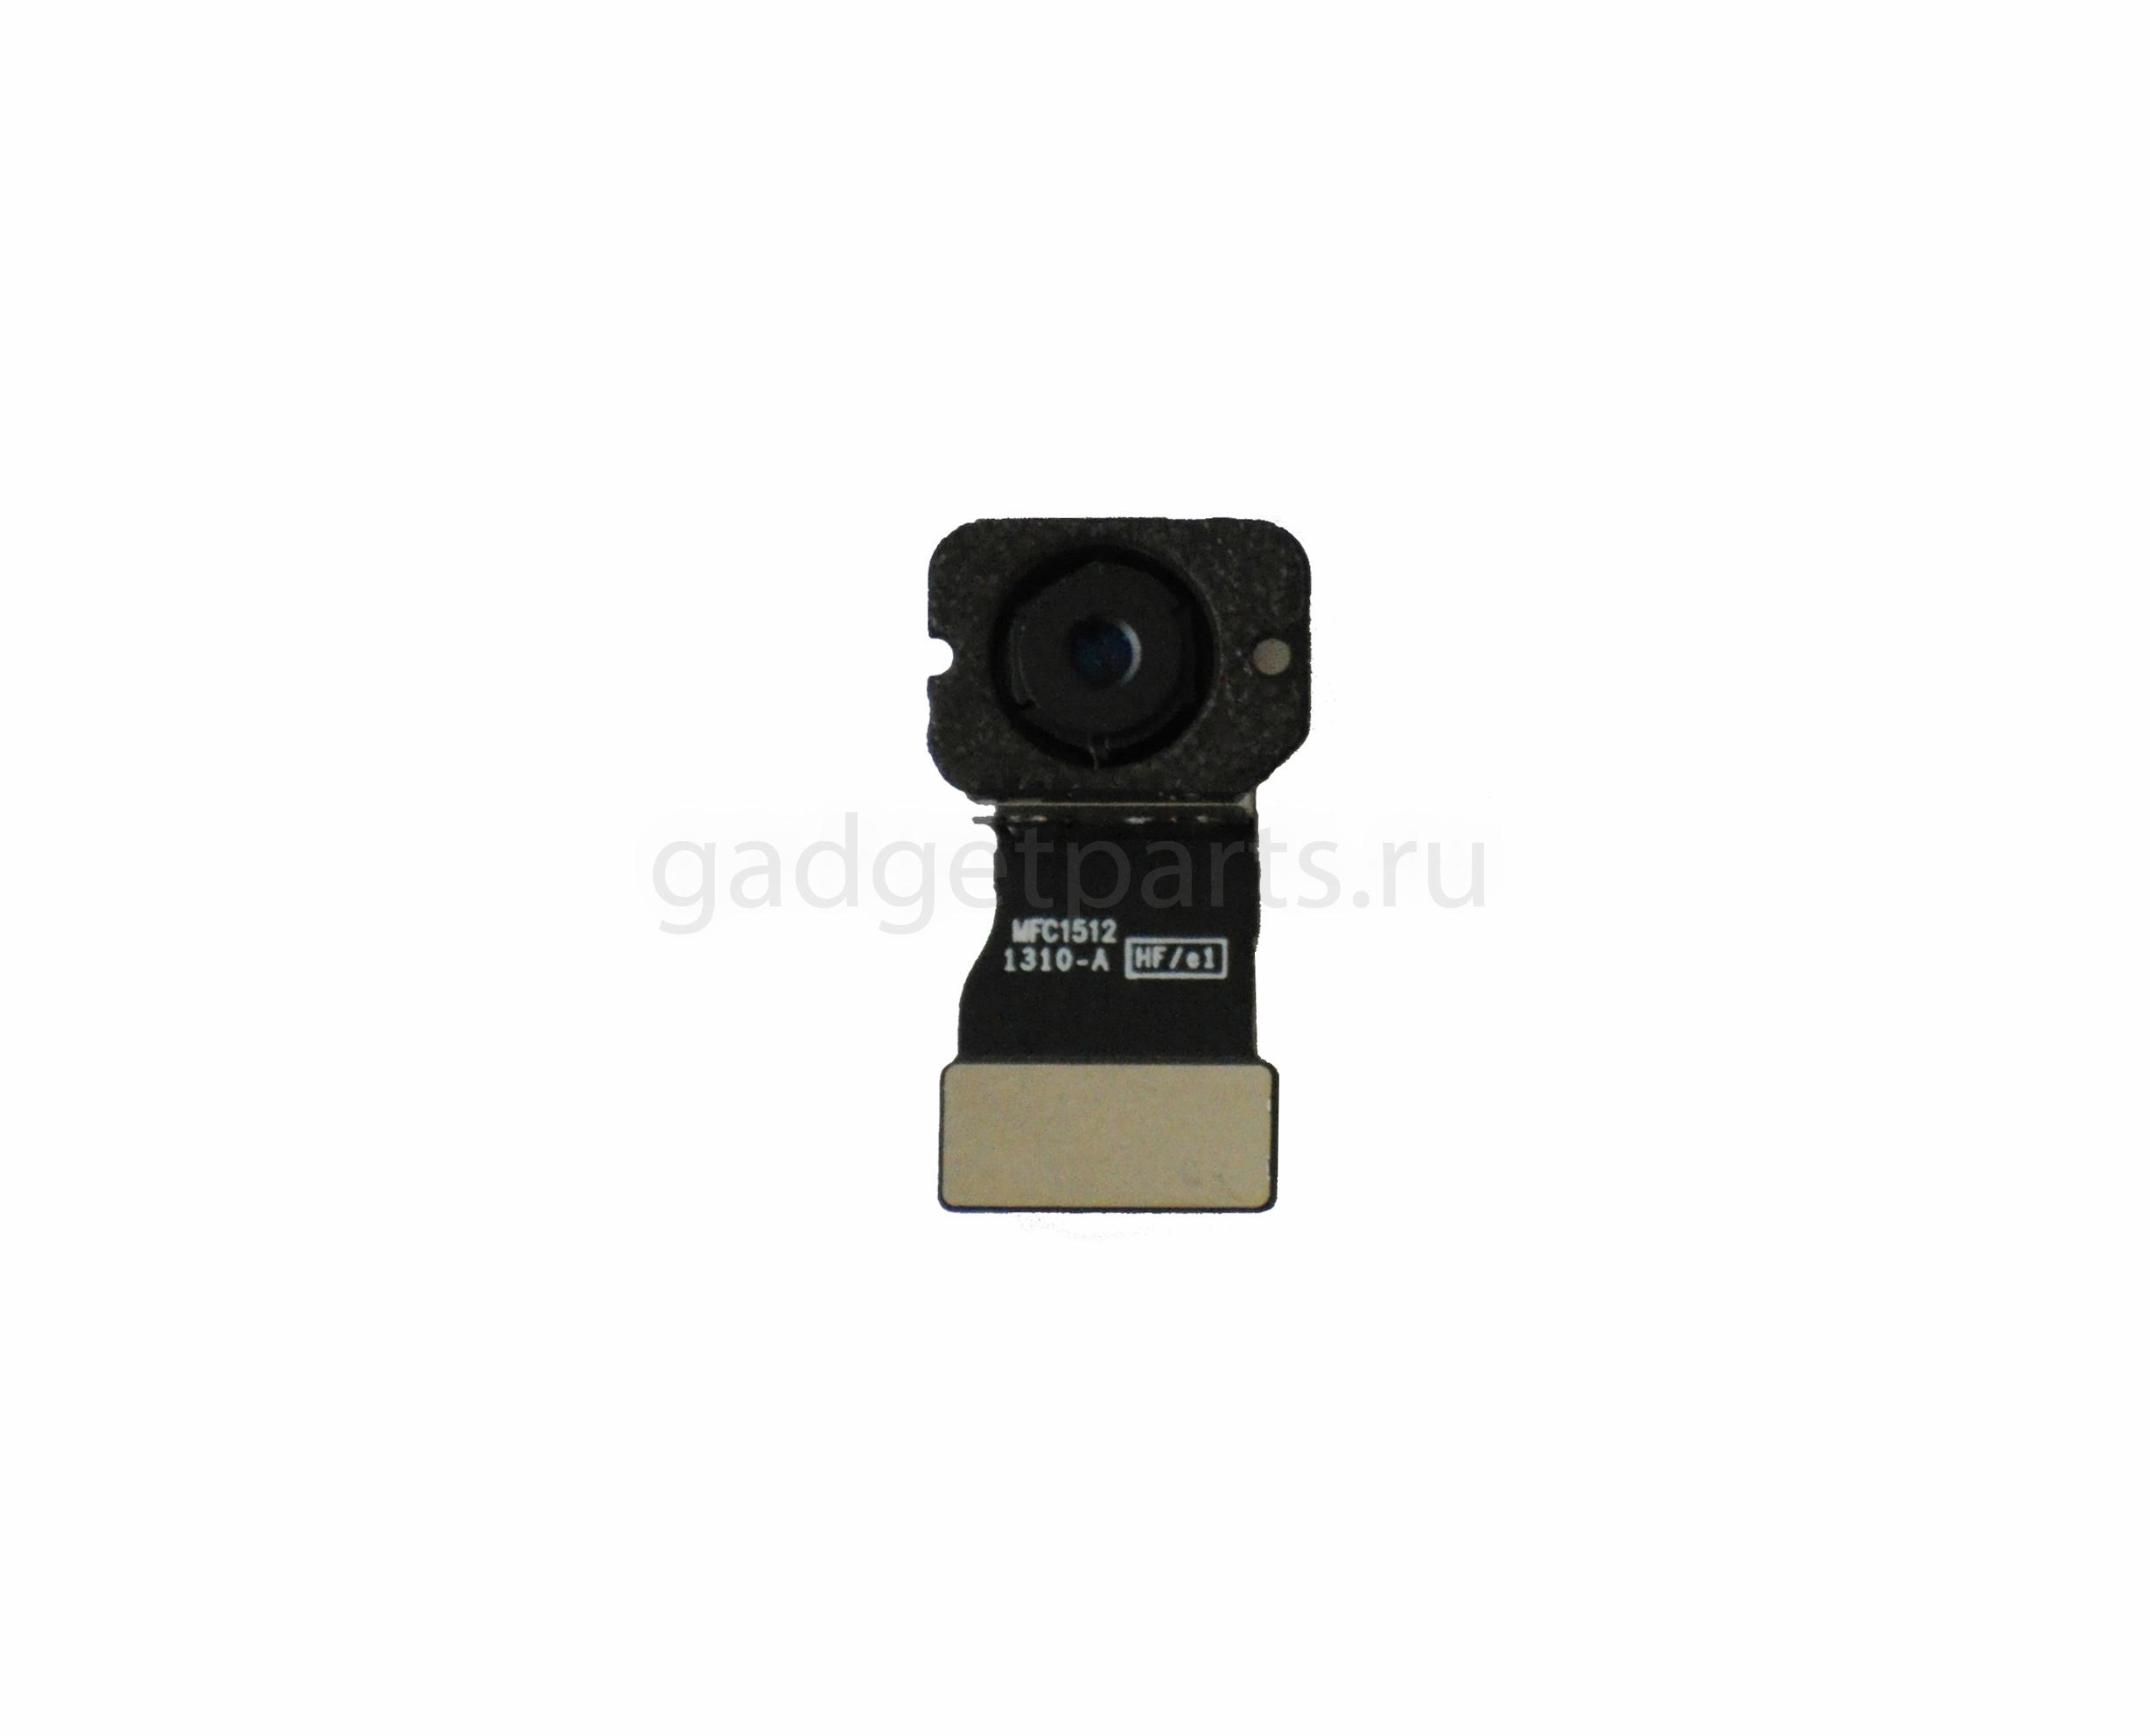 Задняя камера iPad 3, 4